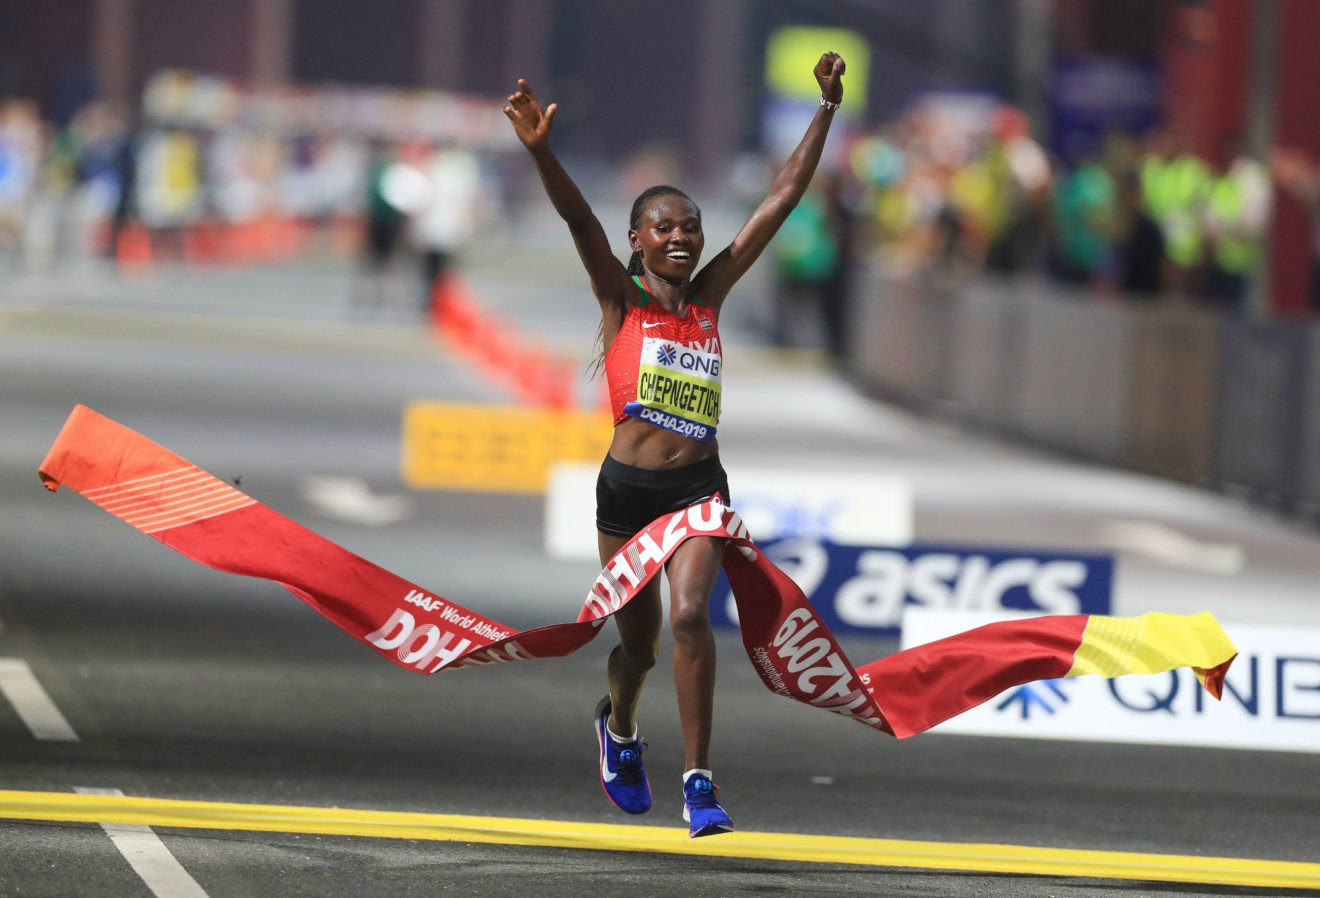 Marathon de Chicago : la Kenyane Chepngetich victorieuse